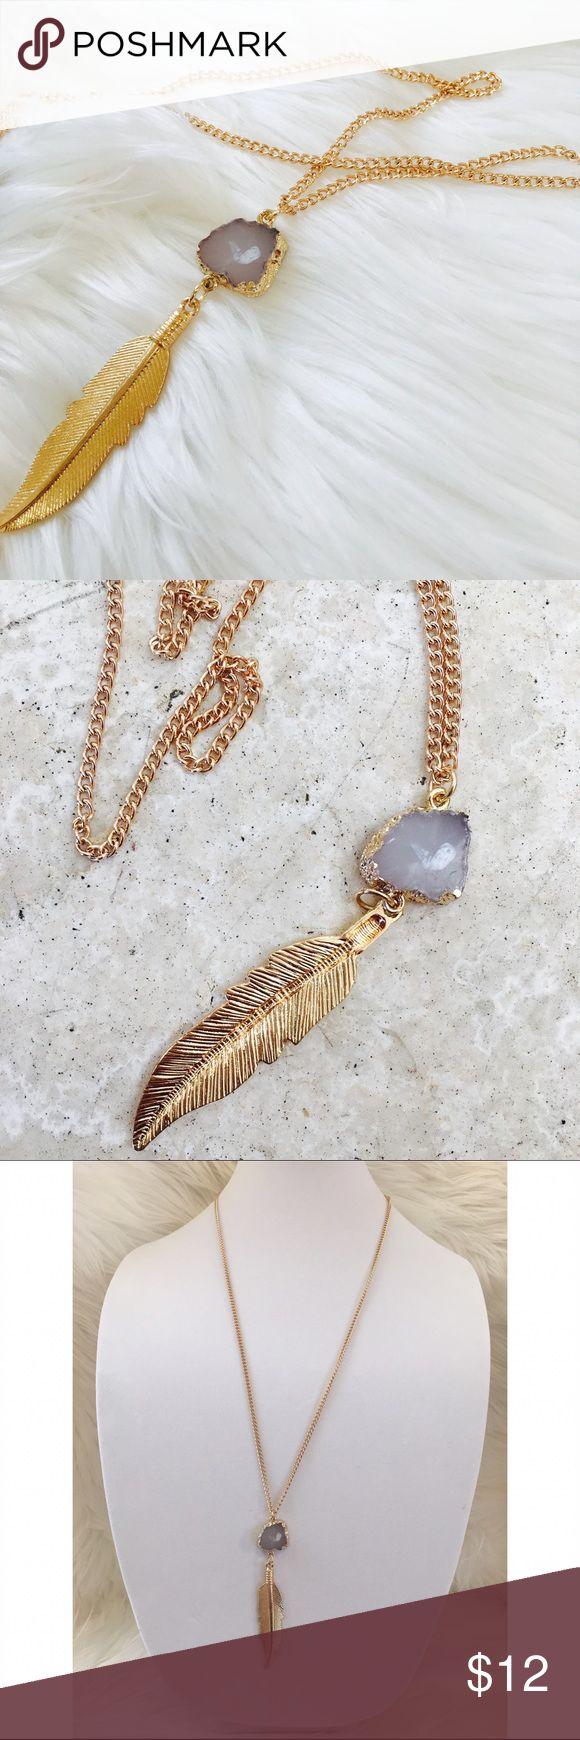 "Gold 28"" long chain necklace leaf faux quartz Gold necklace 28"" long chain with gilded edge faux quartz ✨ adjustable chain clasp closure ✨ pretty leaf pendant ✨ brand new Hype Jewelry Necklaces"